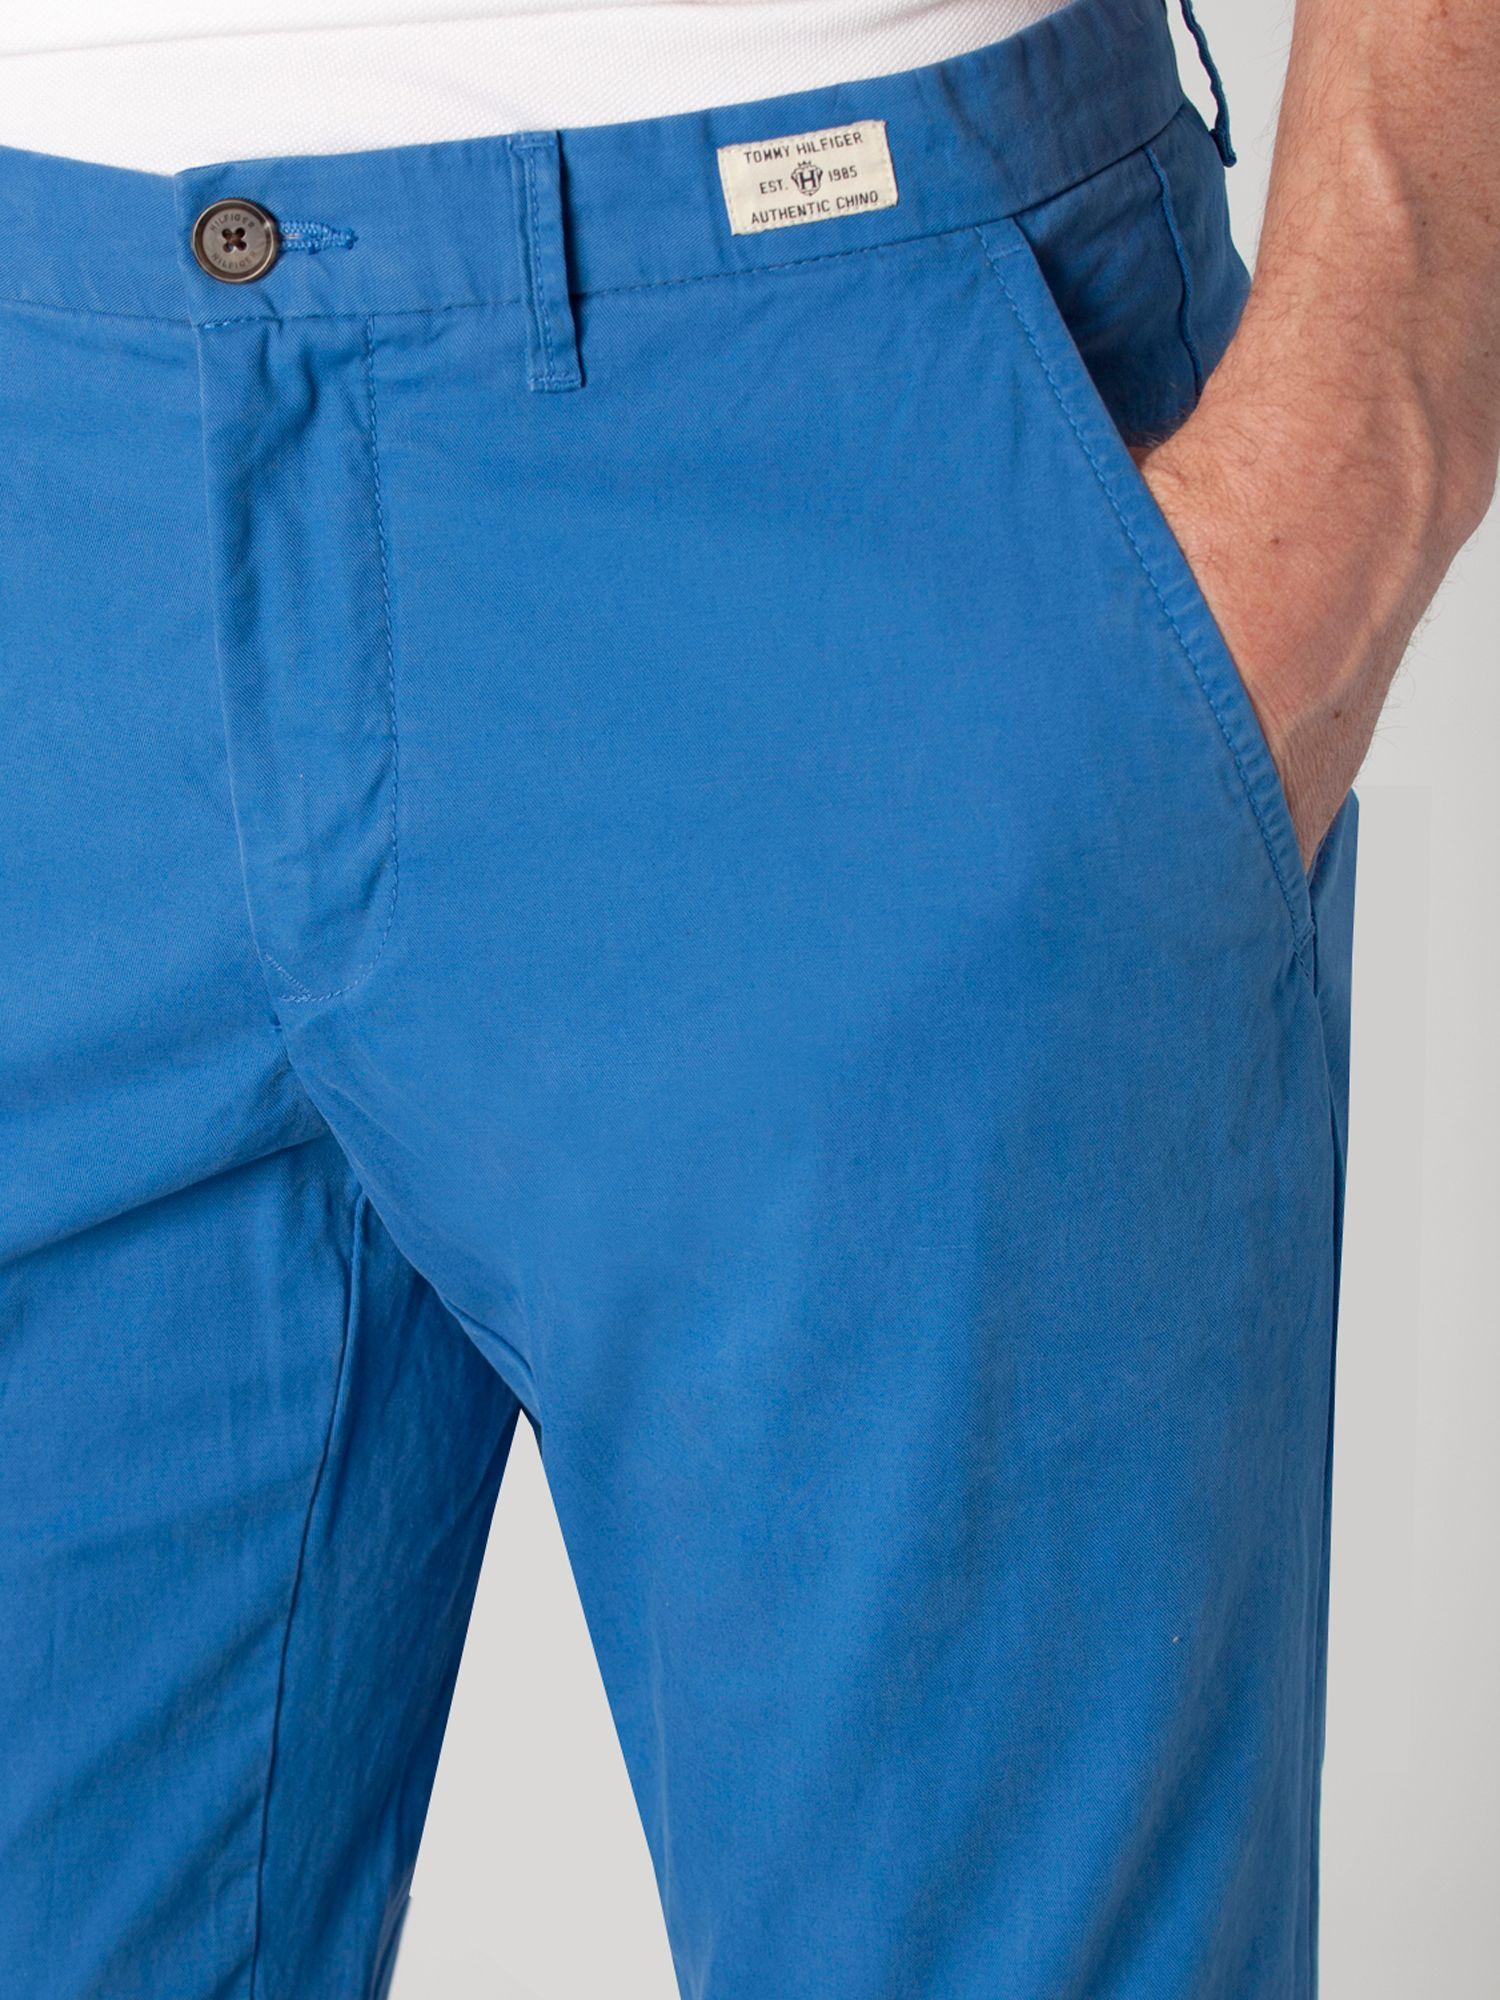 tommy hilfiger mercer chino boston twill in blue for men. Black Bedroom Furniture Sets. Home Design Ideas